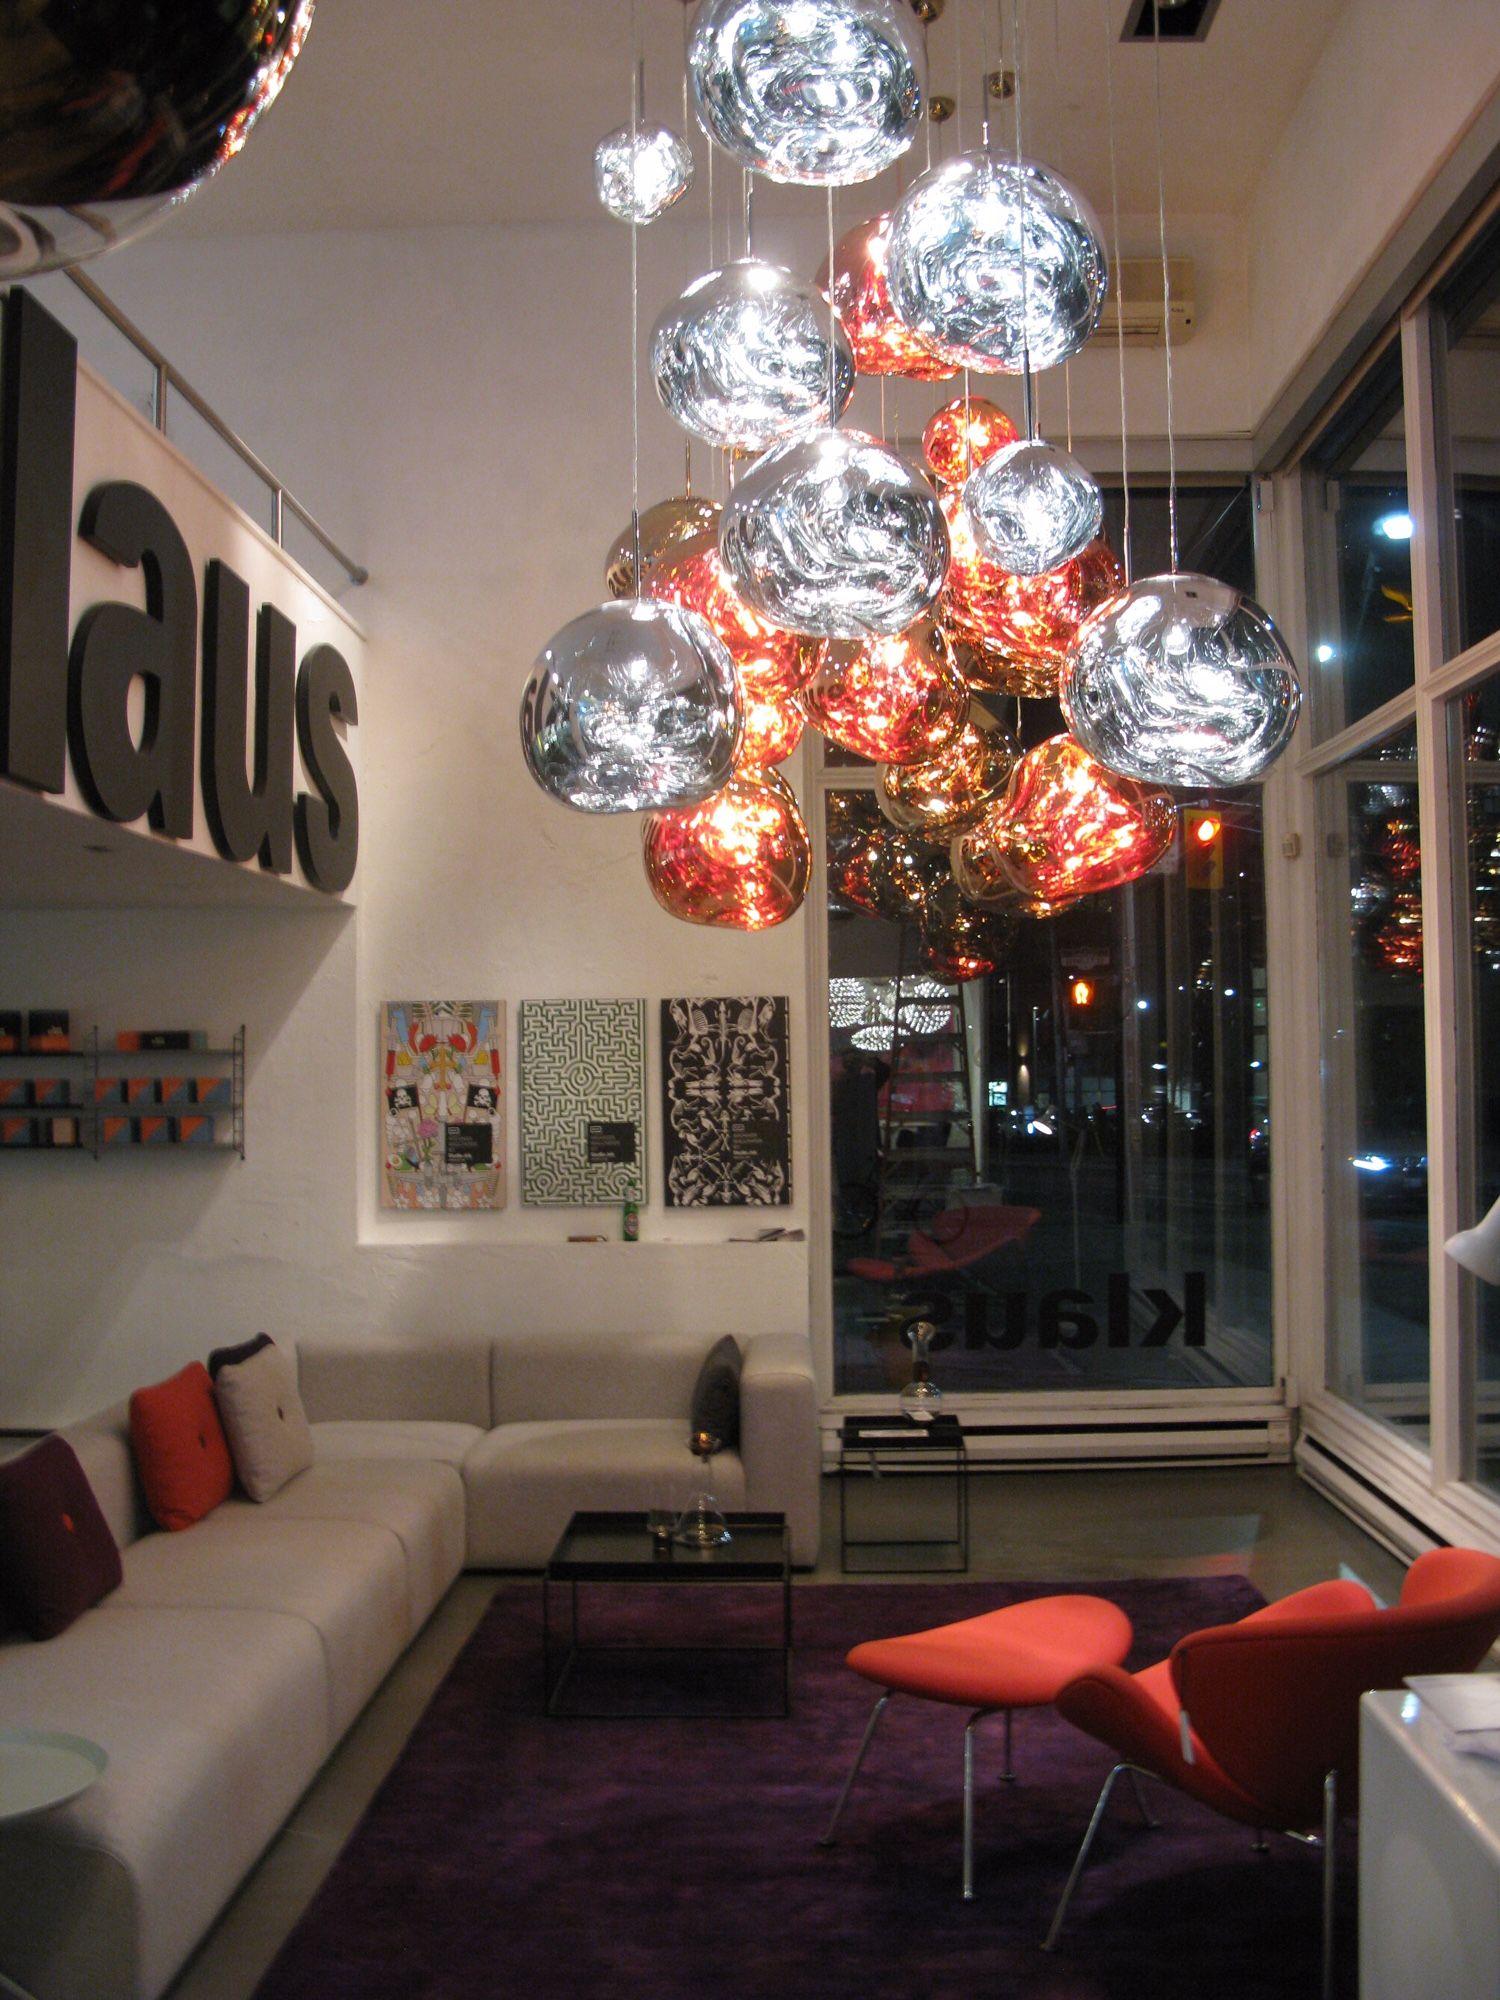 Tomdixon Meltpendant At Klaus Showroom Fancy Lights Tom Dixon Melt Swedish Design